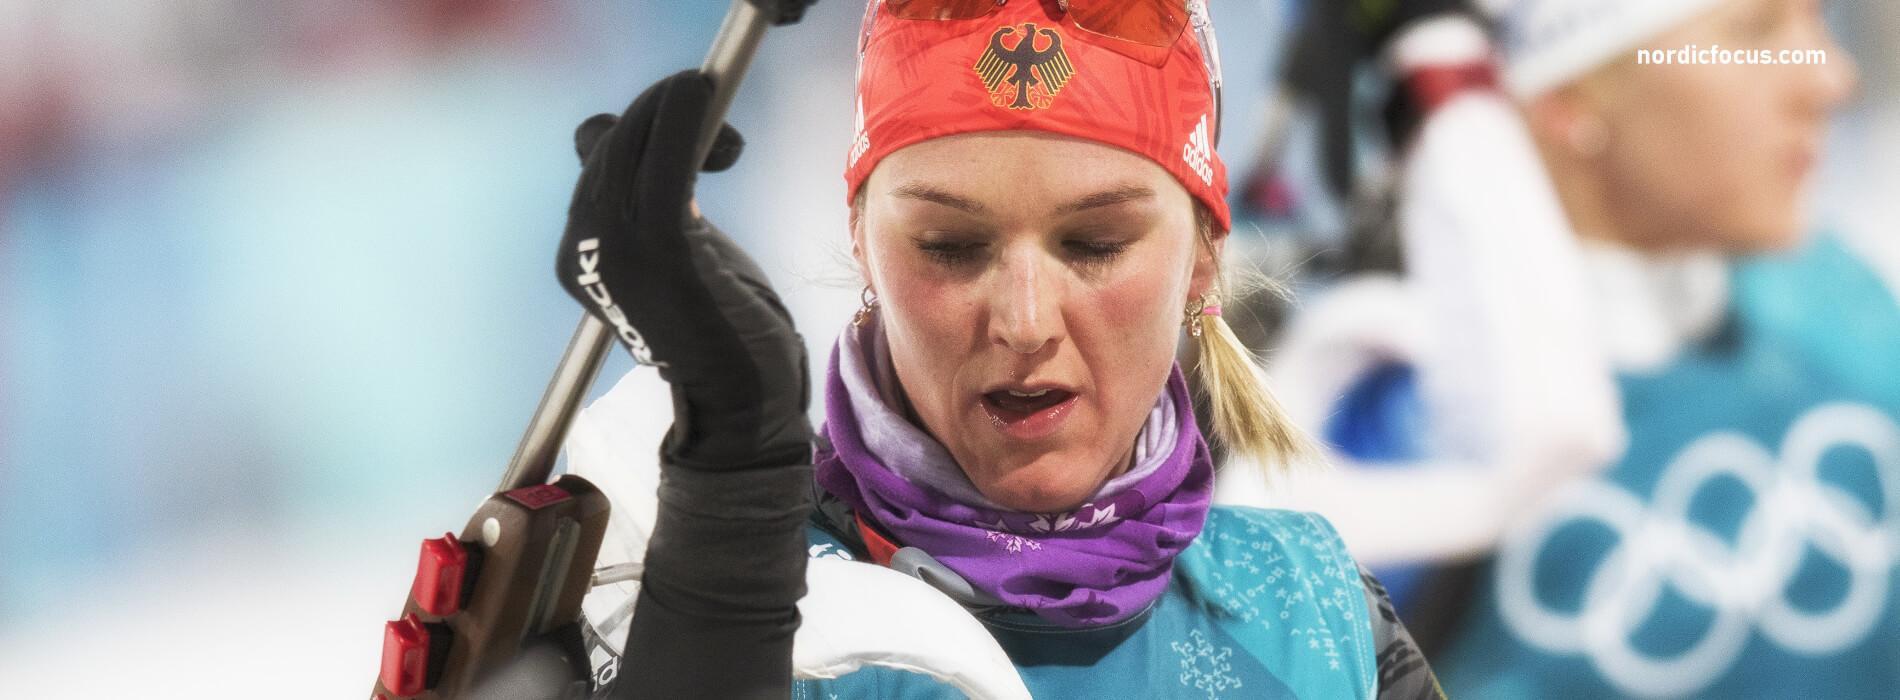 Biathlon Statistik